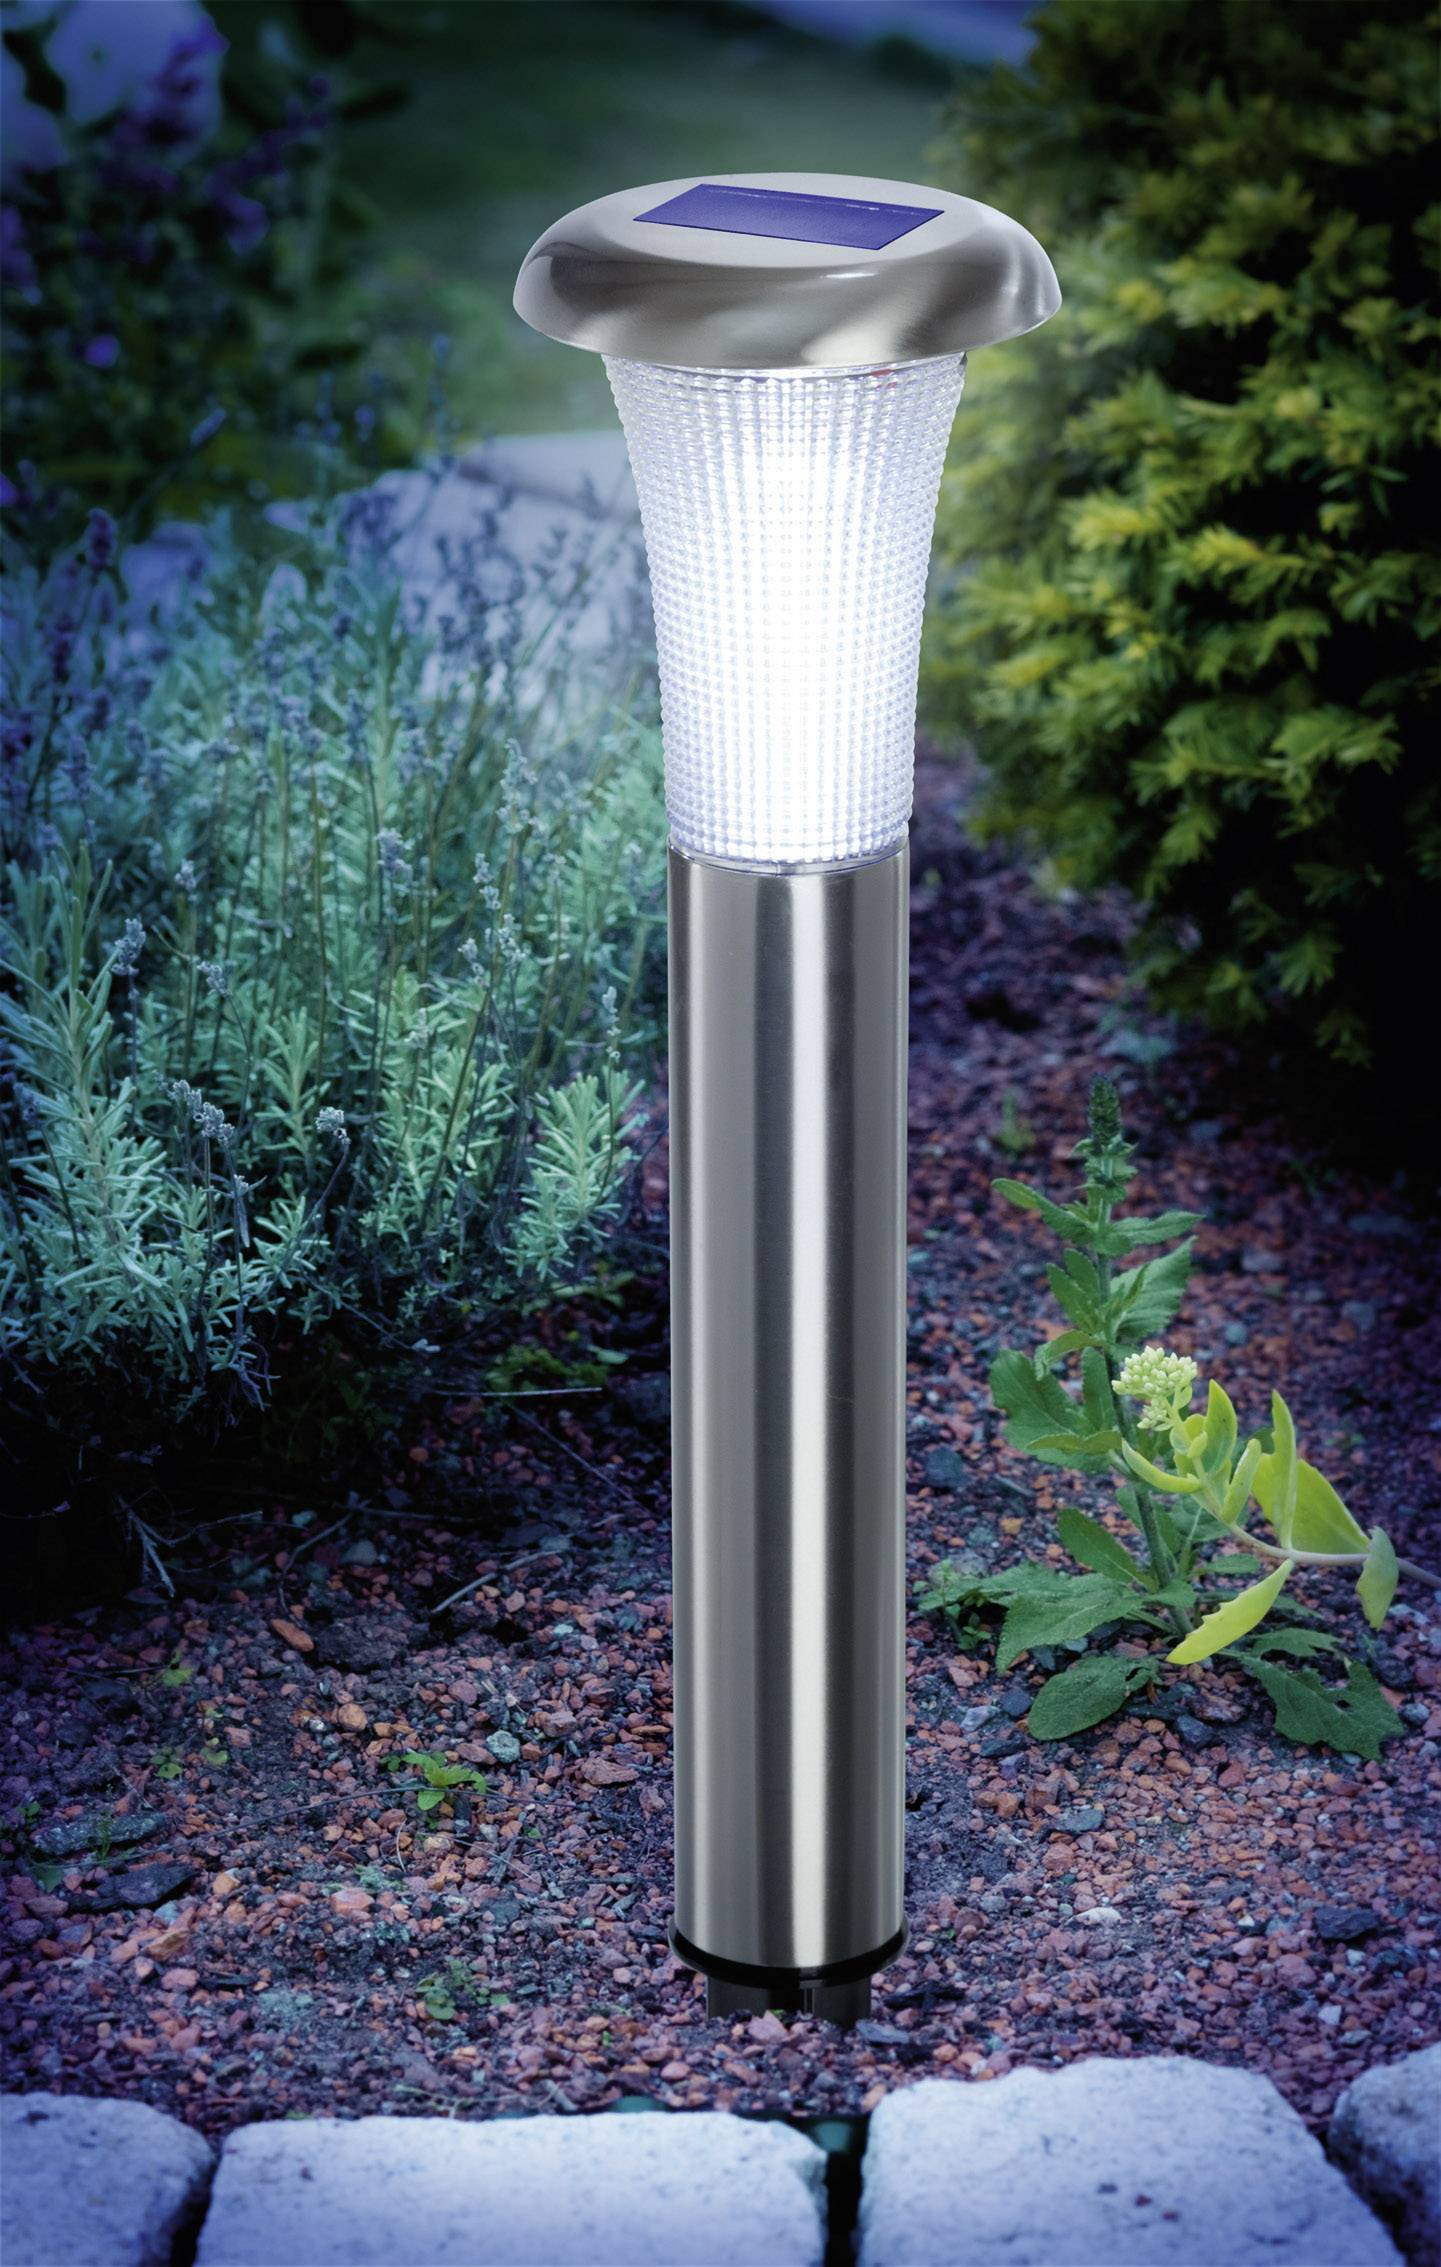 Solárne tyčové svietidlo LED Esotec Vezuv, 1x 1.2 V, IP44, nerez